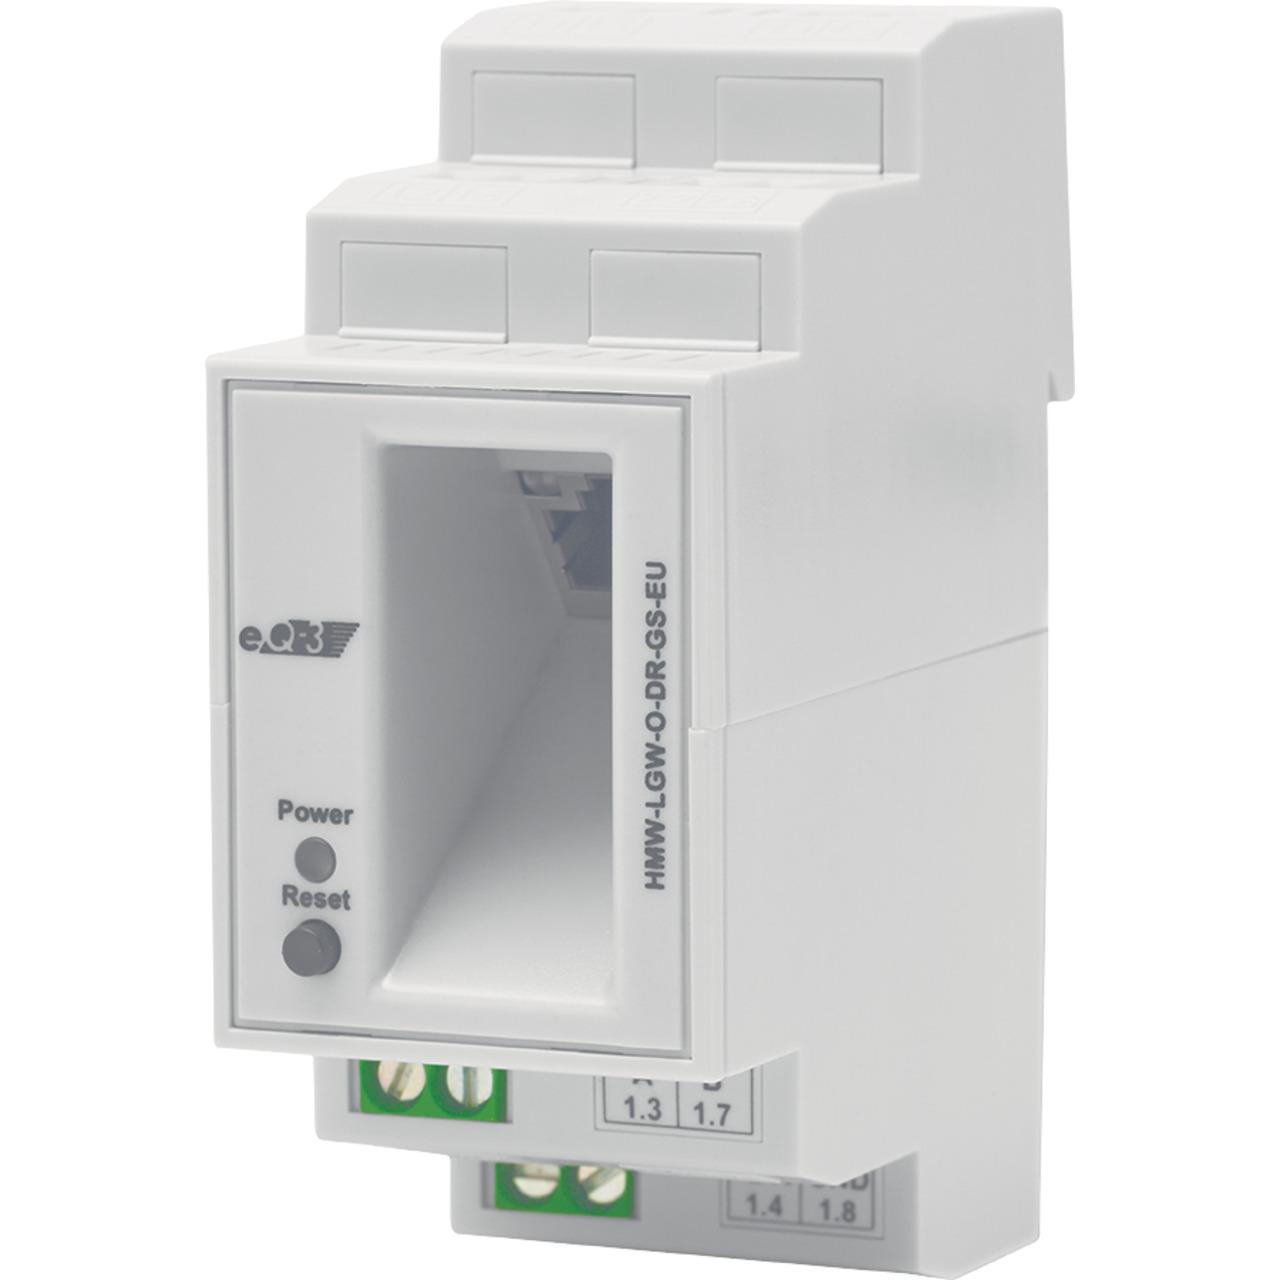 Homematic Wired RS485 LAN Gateway- Hutschienenmontage HMW-LGW-O-DR-GS-EU